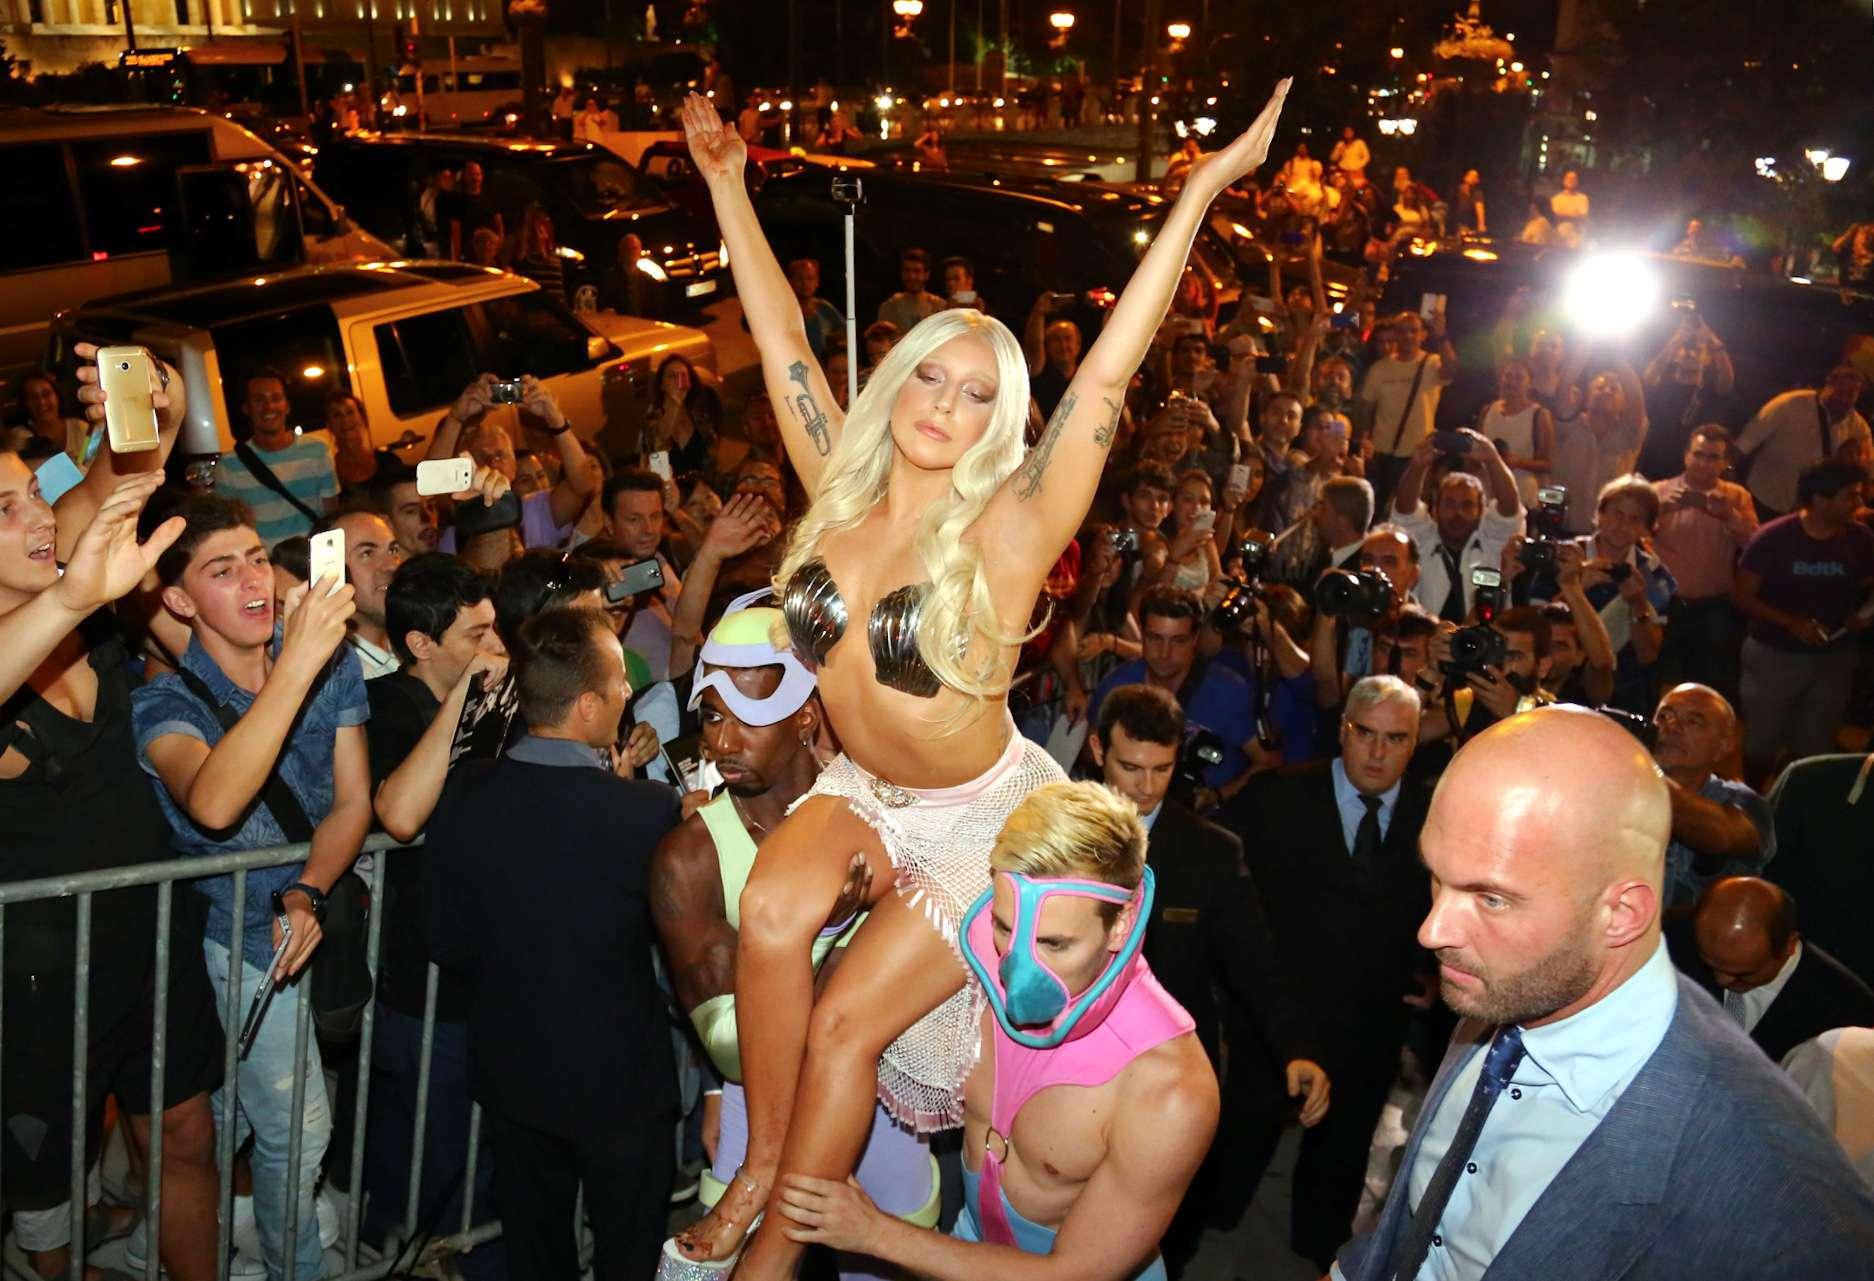 Lady Gaga veste look ousado Foto: The Grosby Group